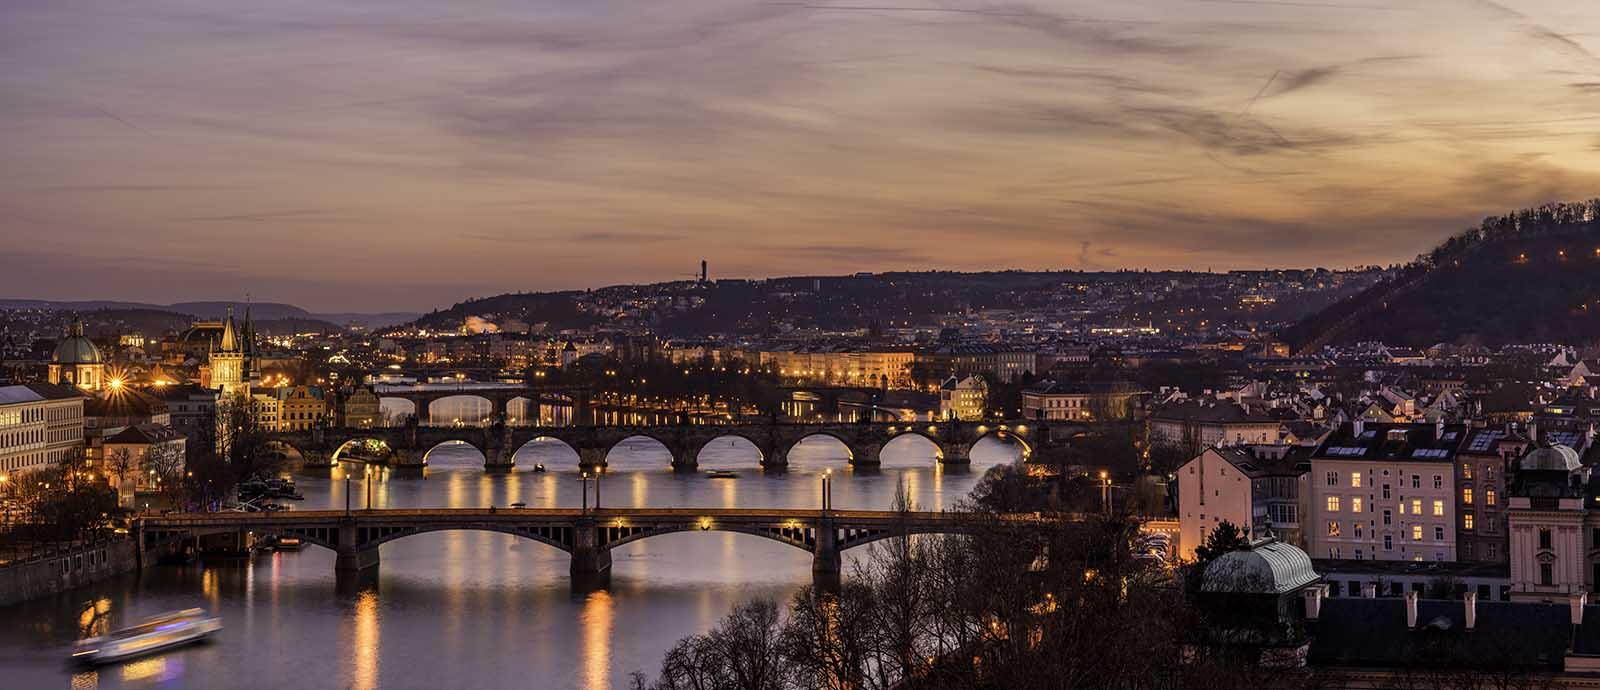 Prague-Zeiss-Cityscape-Panorama-Travel